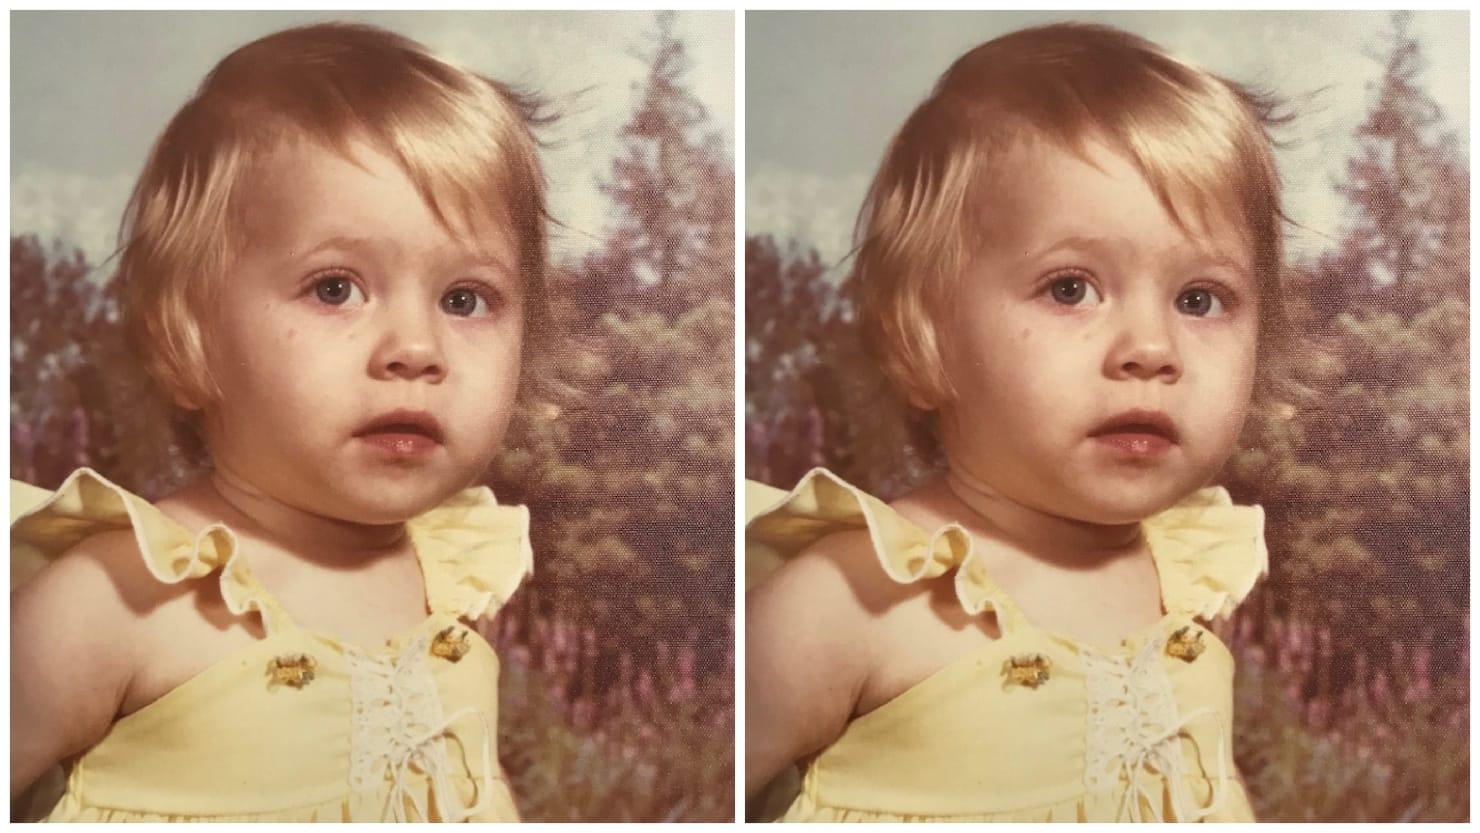 'Delta Dawn,' Toddler Found Dead in Mississippi River in 1982, Is Identified